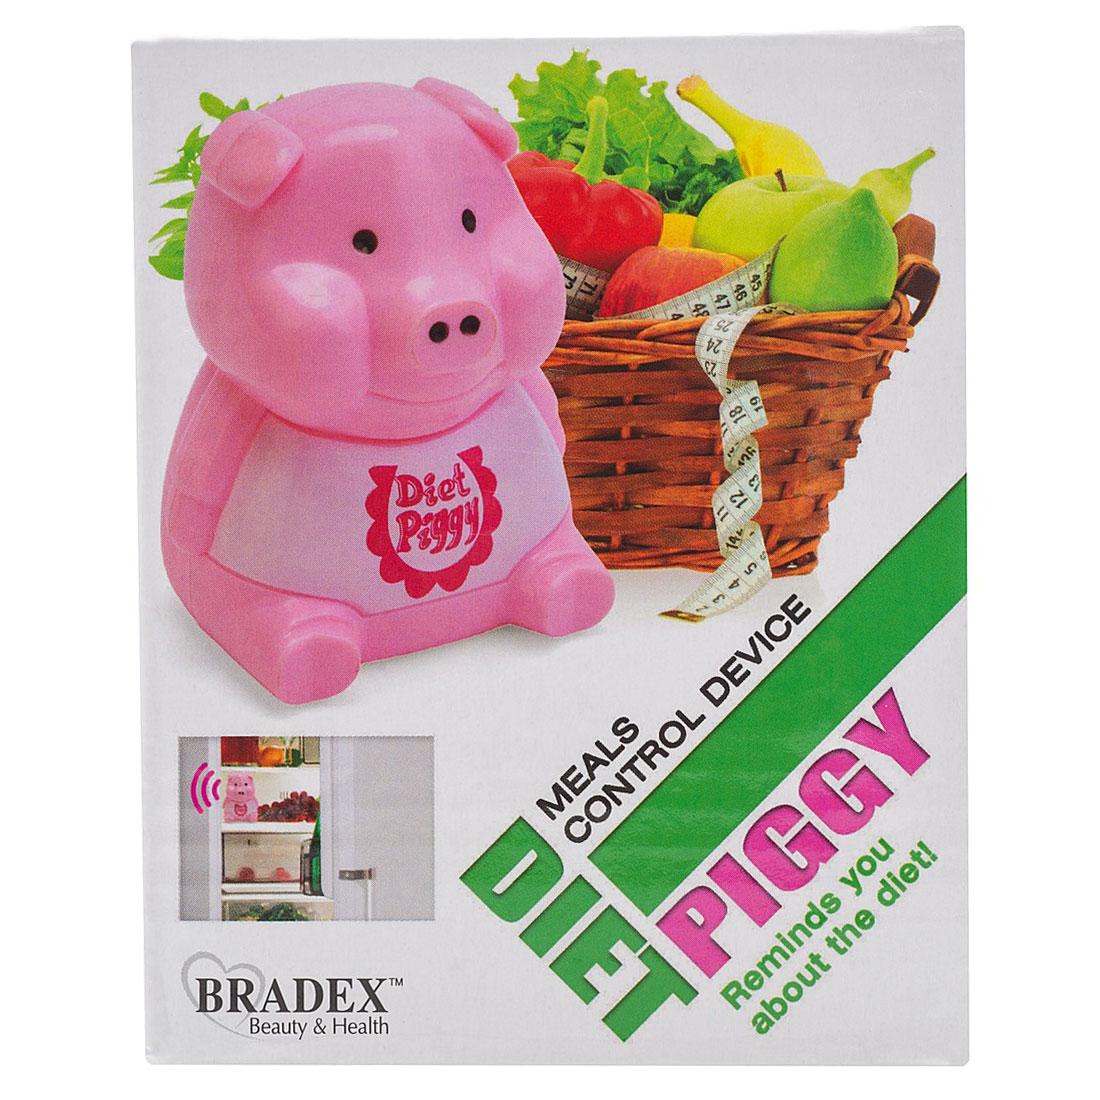 ���������� Bradex ������-�������� ��� �������� ��� ��������